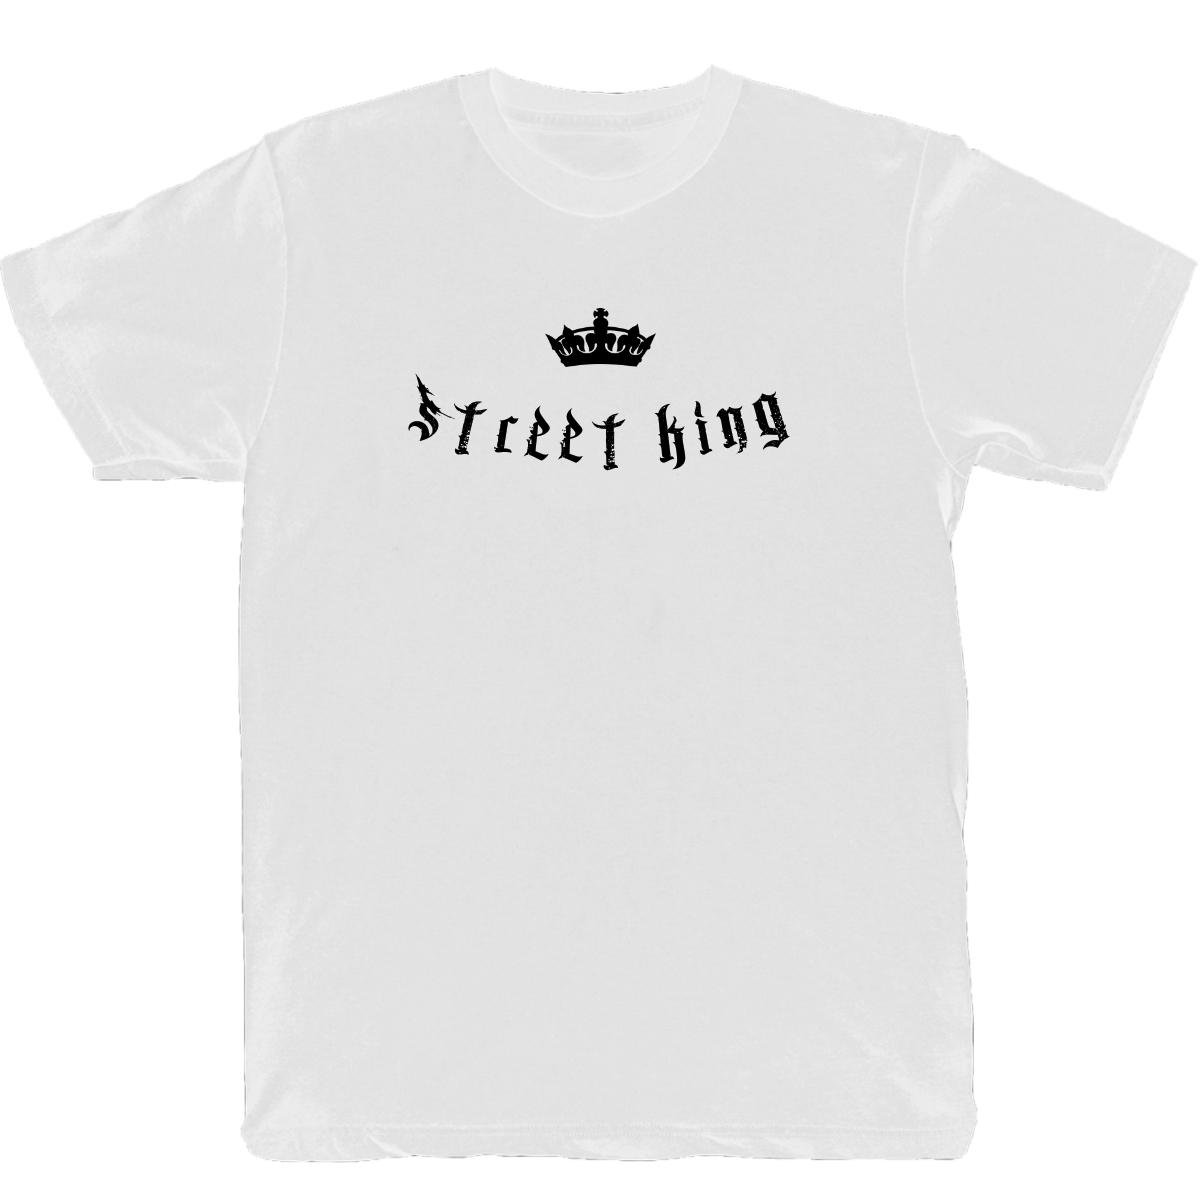 Street King T-Shirt